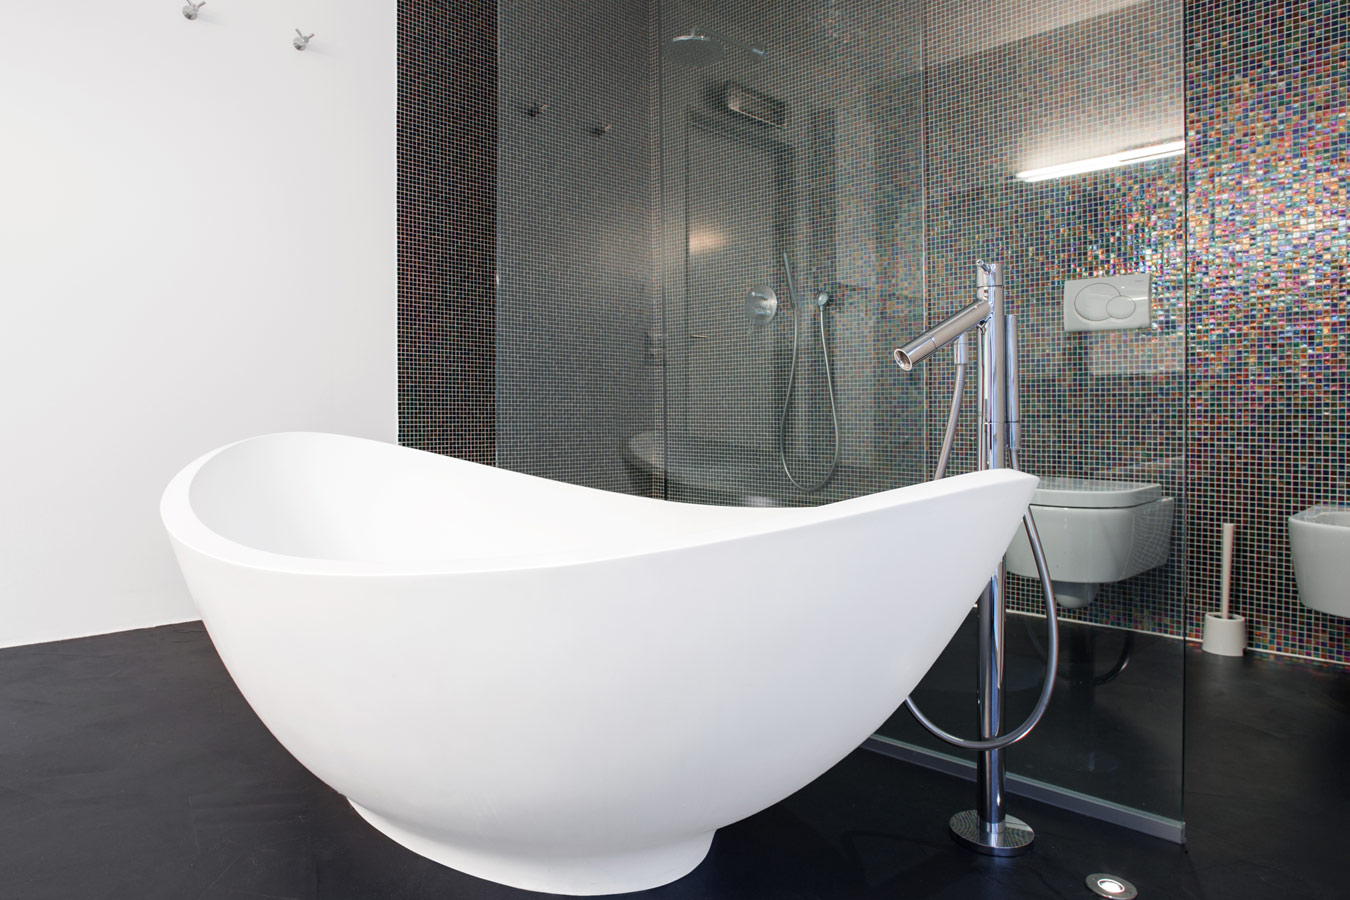 Moderne badkamers inspiratie foto 39 s en tips - Badkamer zwarte vloer ...